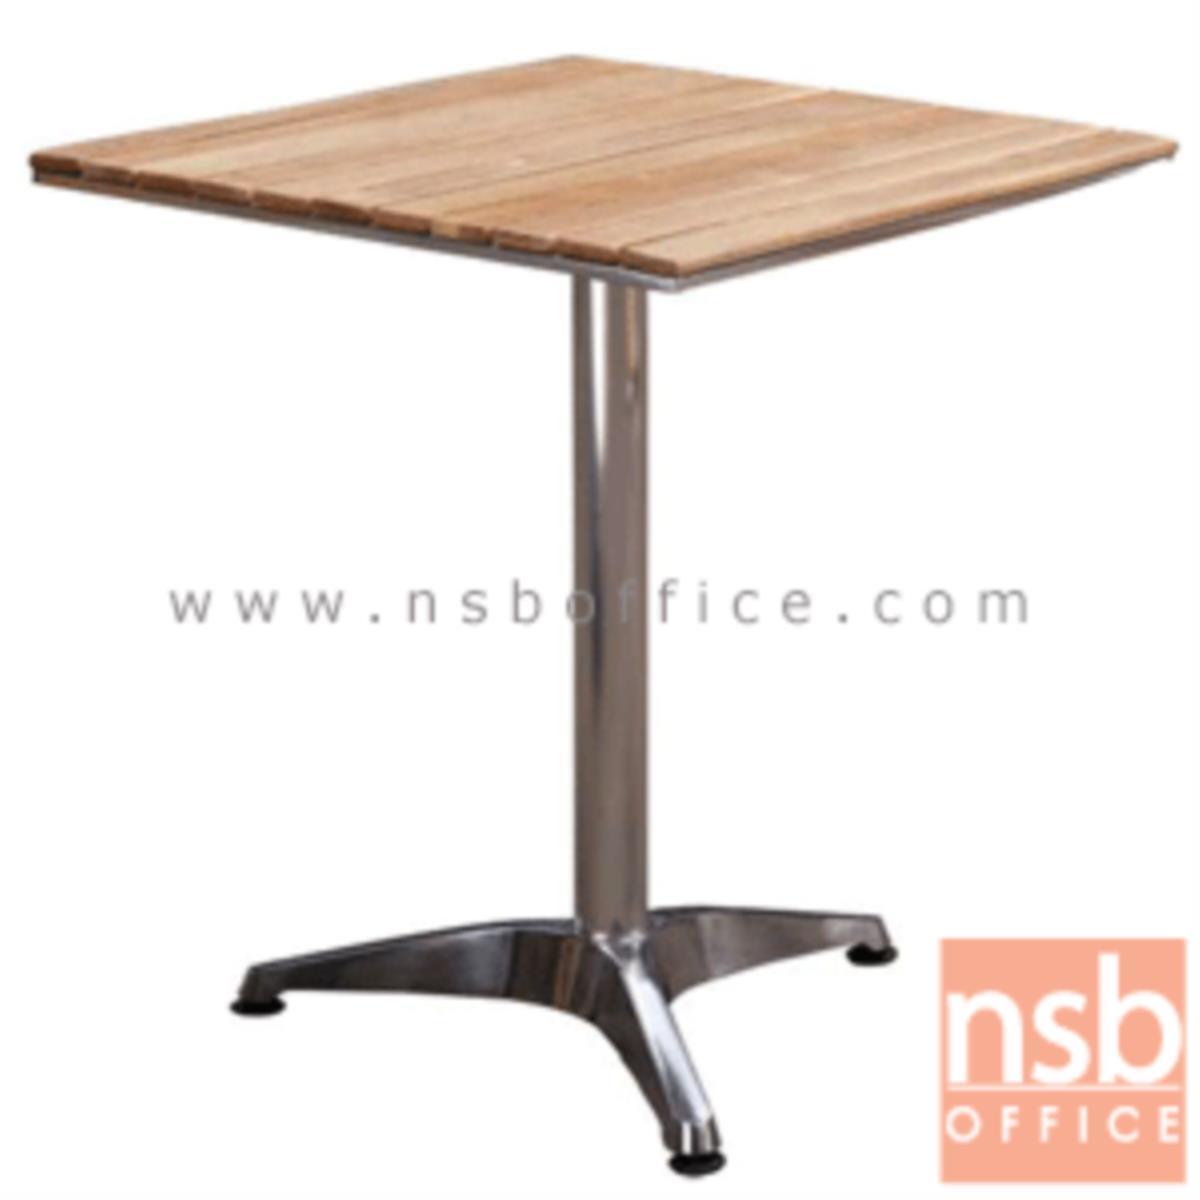 A09A081:โต๊ะบาร์หน้าไม้สน รุ่น Hudgens (ฮัดเจนส์) ขนาด 60W cm.  โครงอลูมิเนียม